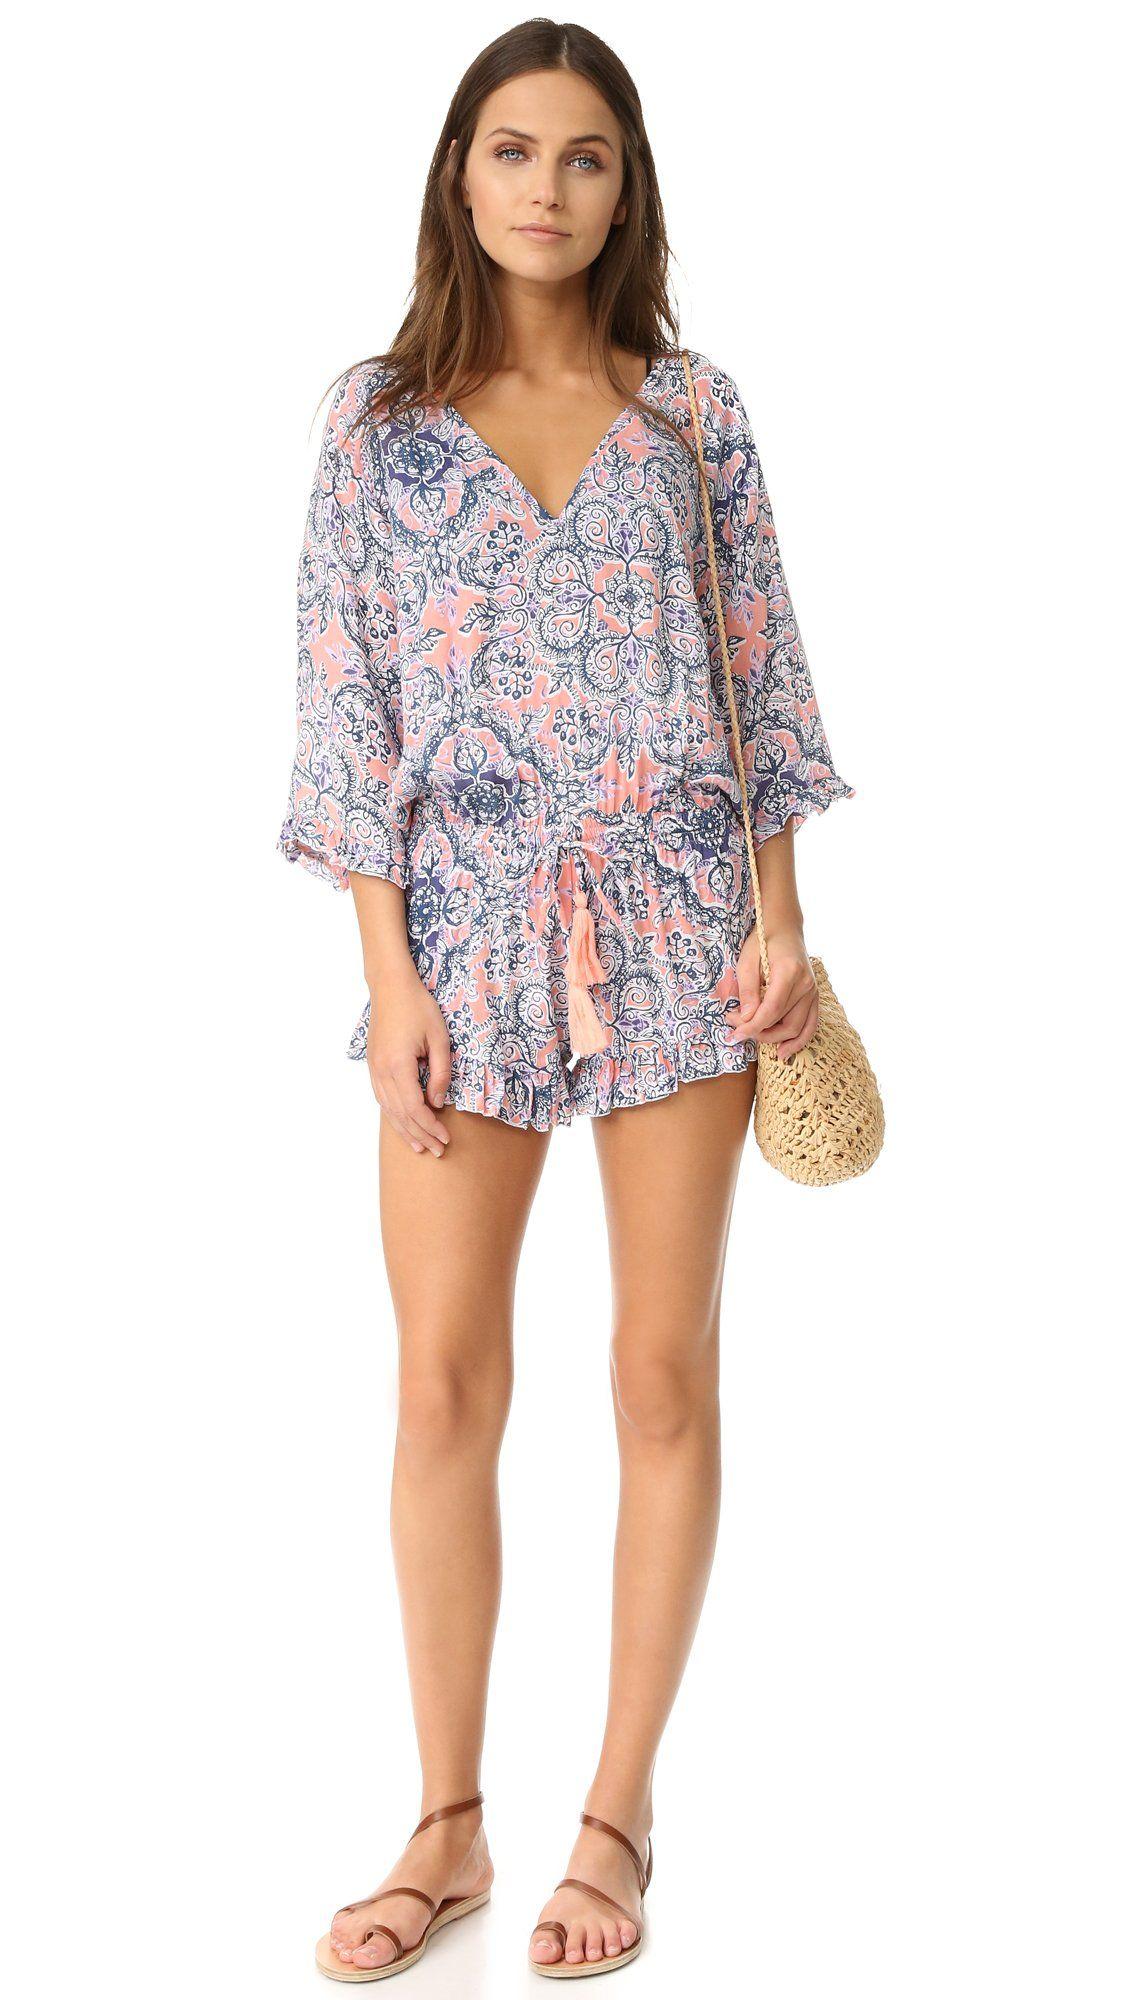 695d4aed34 Tiare Hawaii Womens Pahoa Romper Batik Peach/Gray One Size *** Learn ...